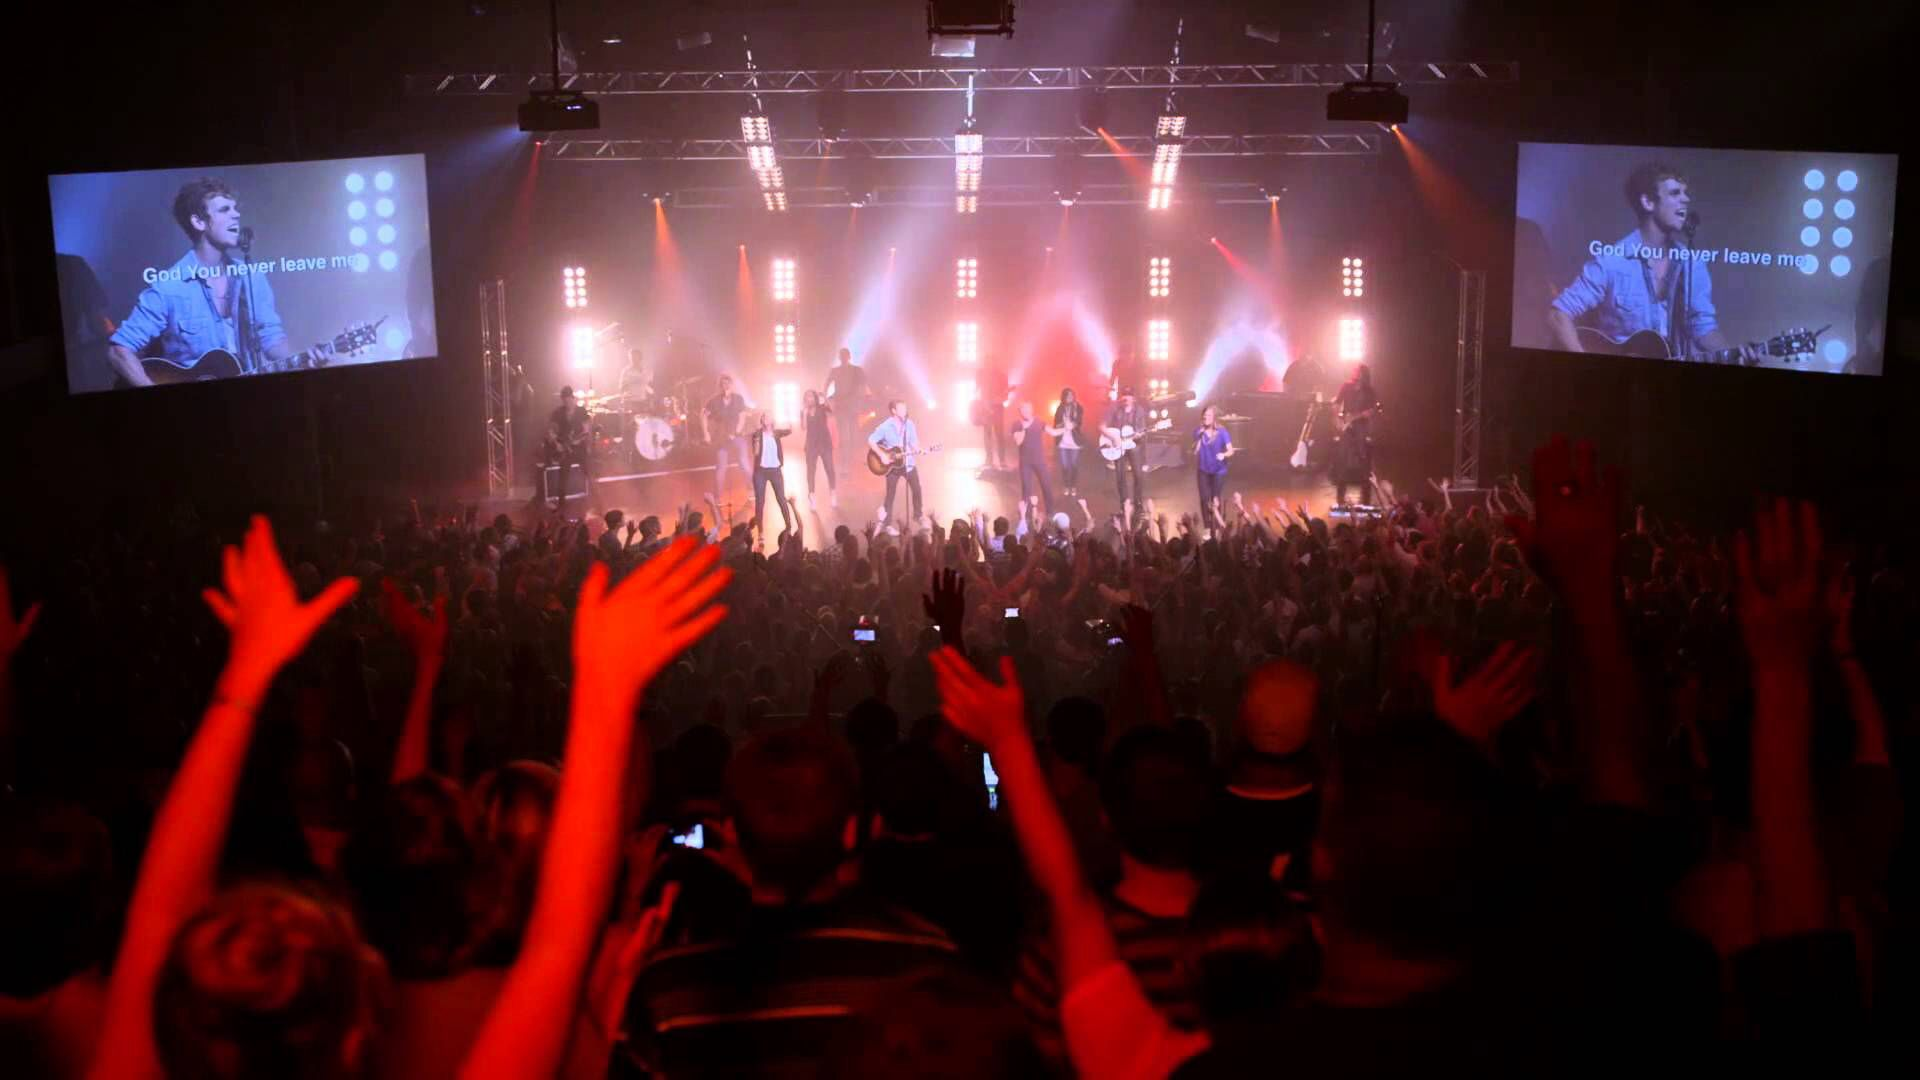 Elevation Church Night Of Worship Worship Music Inspirational